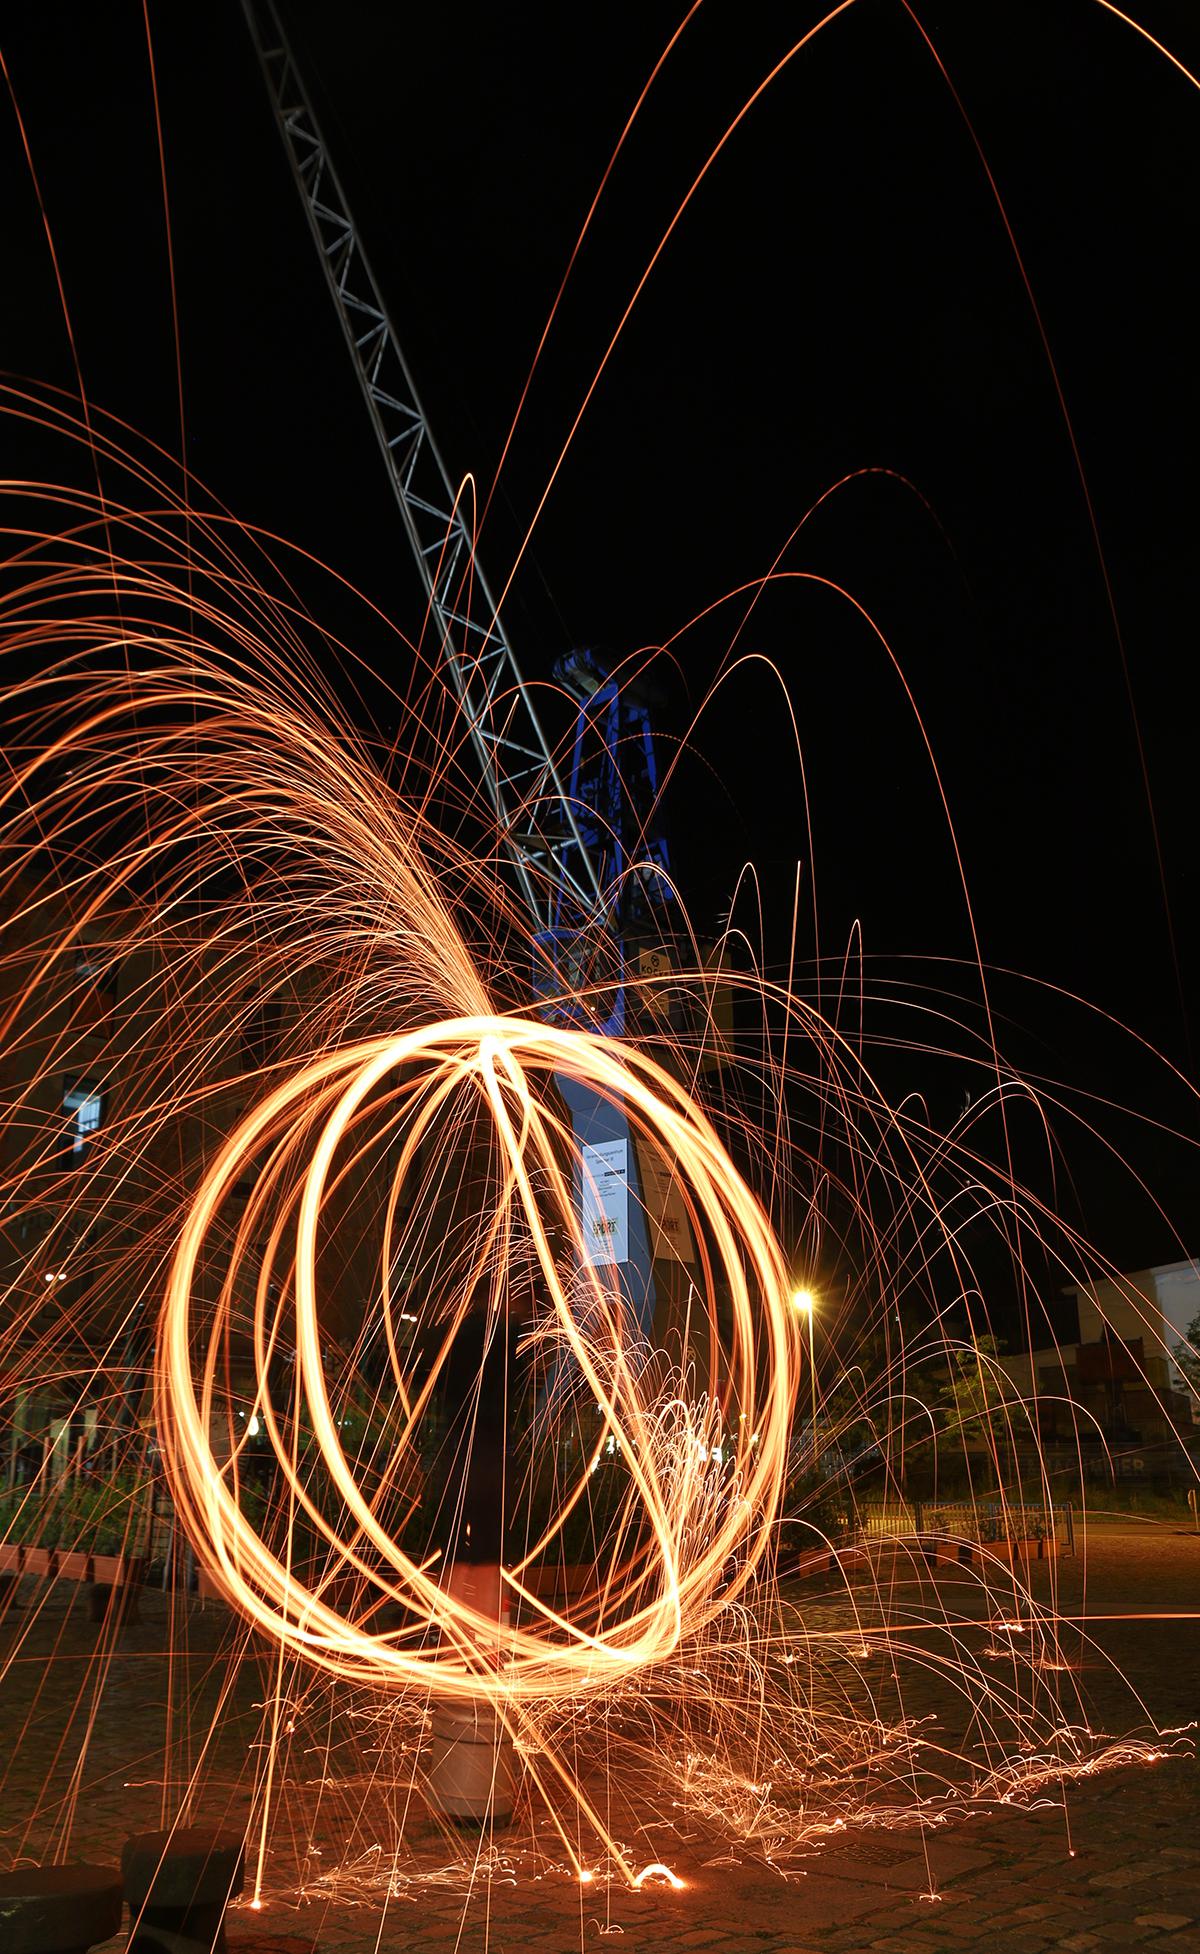 Stahlwolle Lichtexperiment